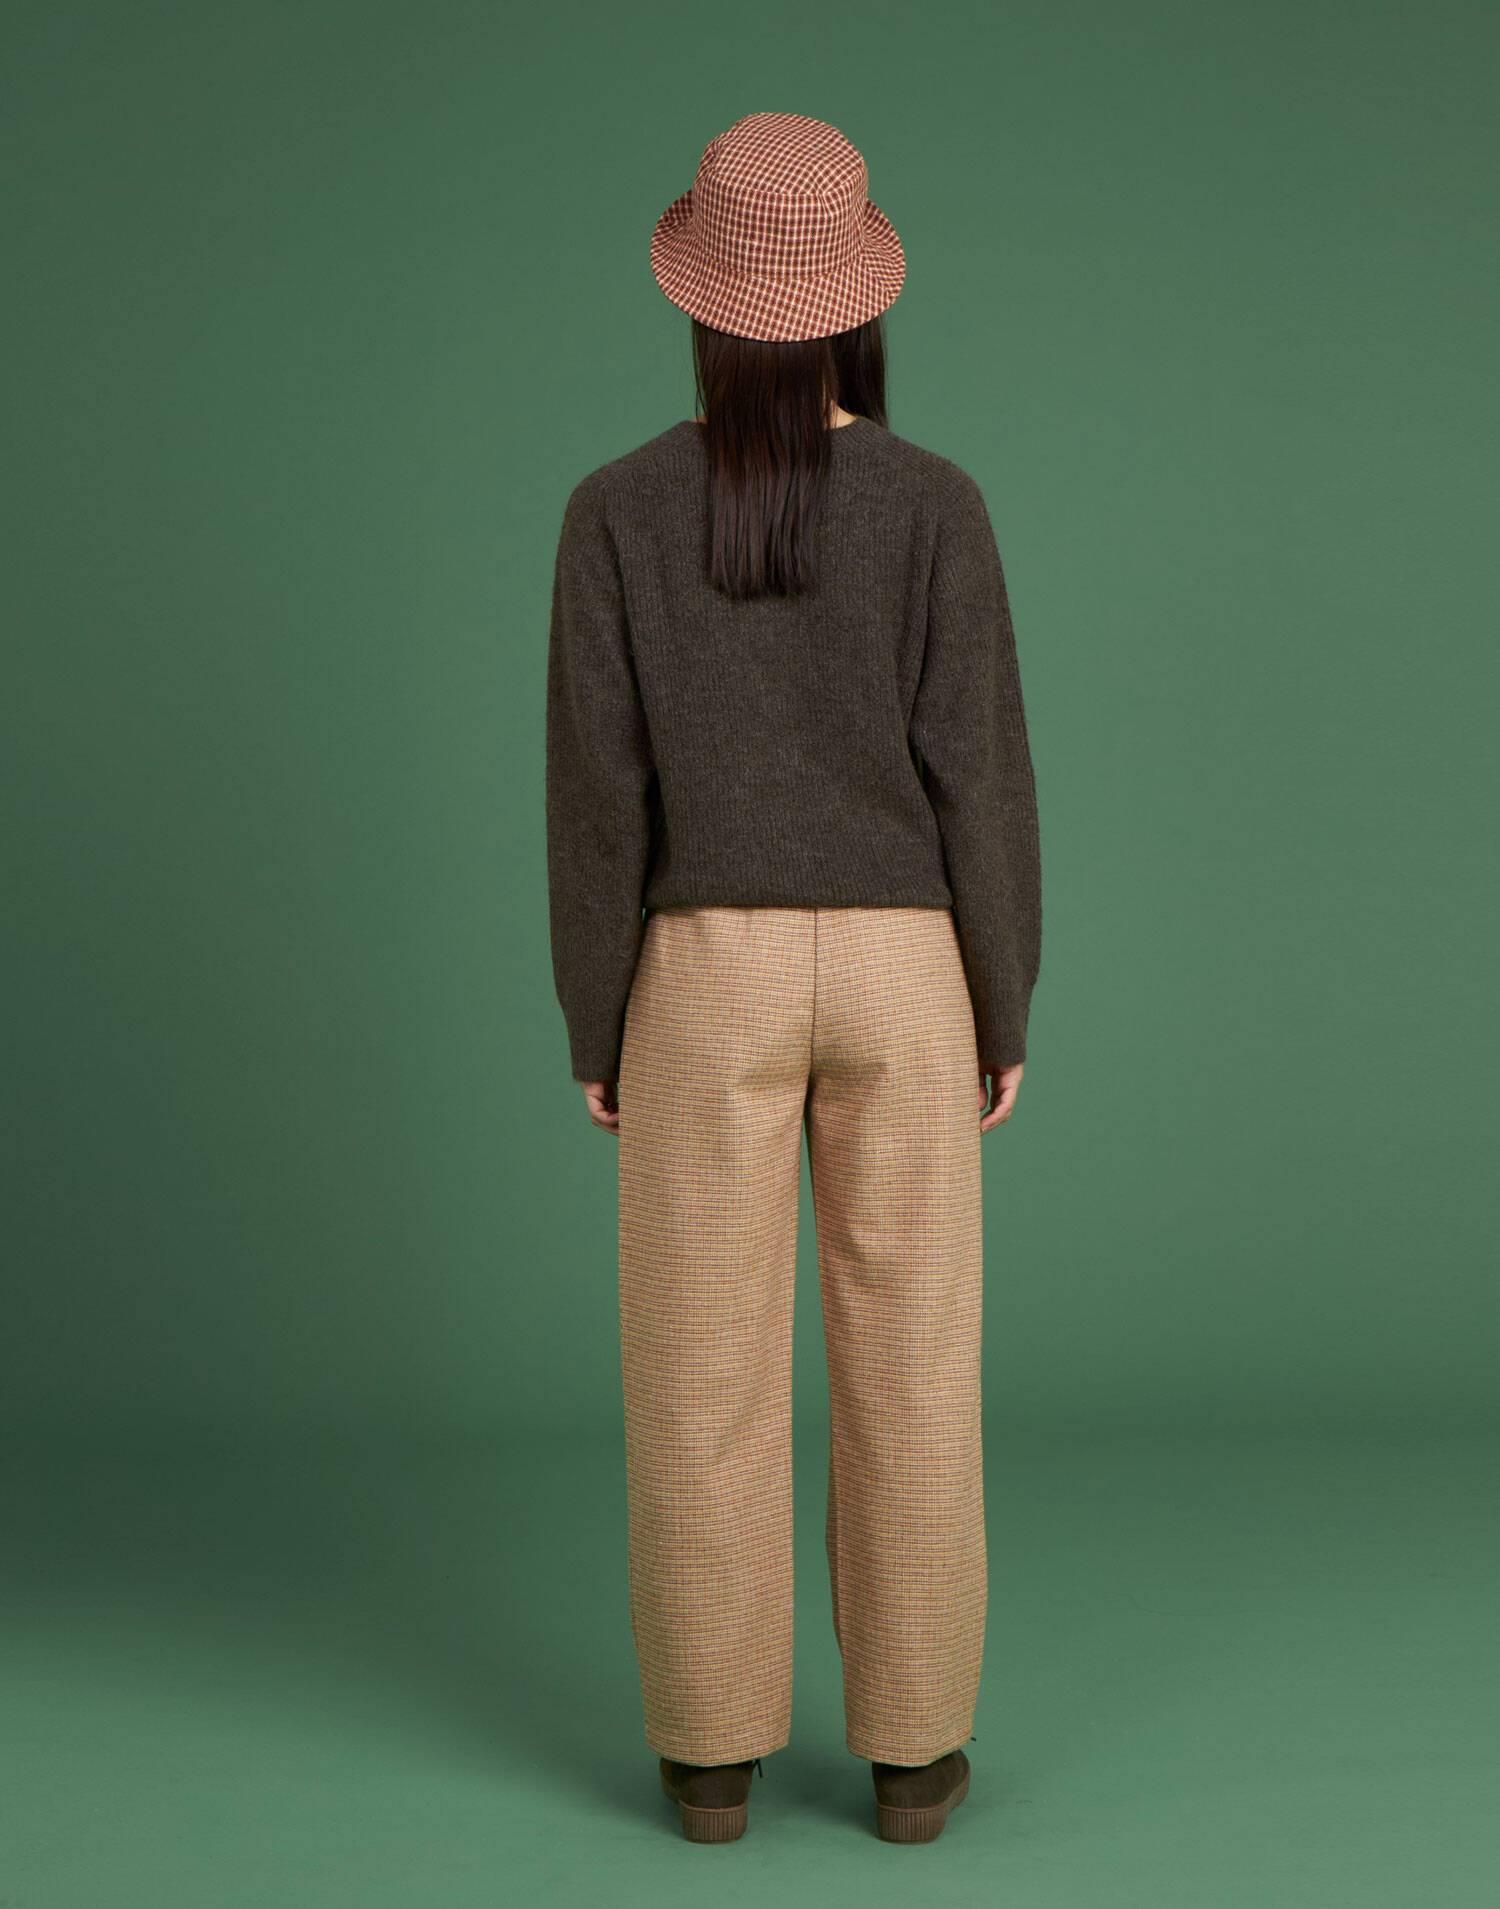 Ribbed unisex sweater